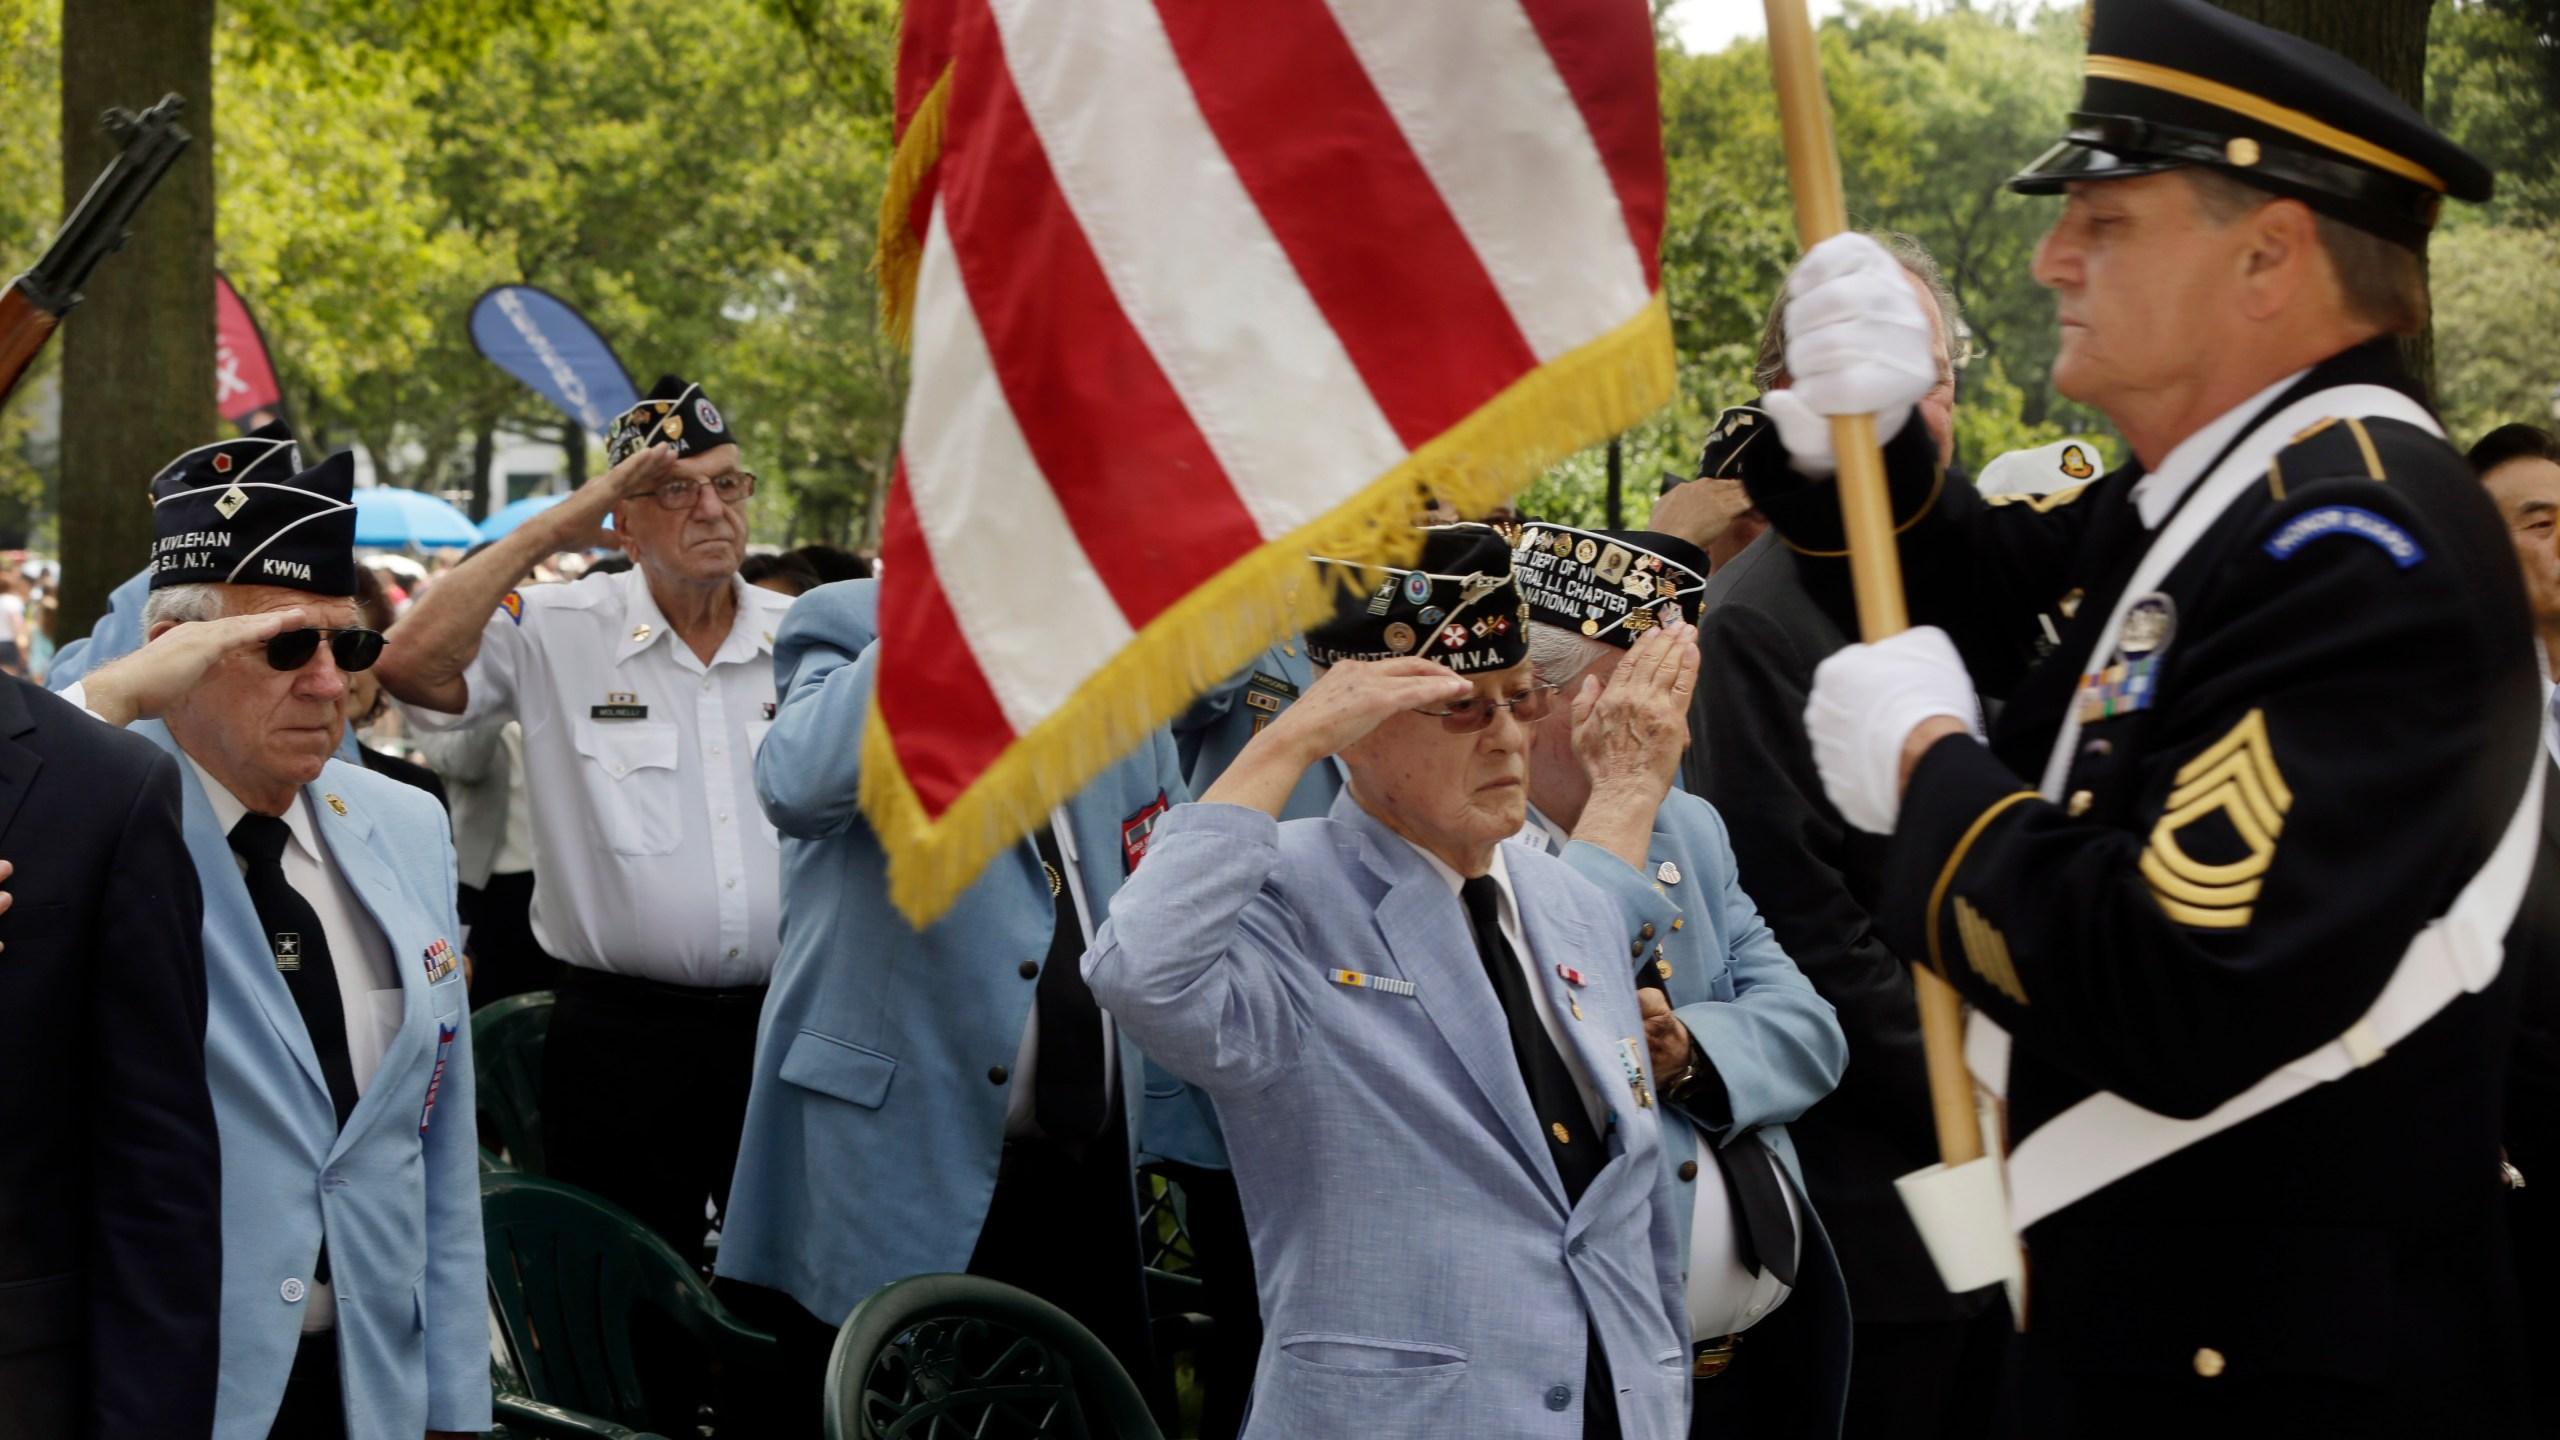 Korean_War_Veterans_17913-159532.jpg84681179